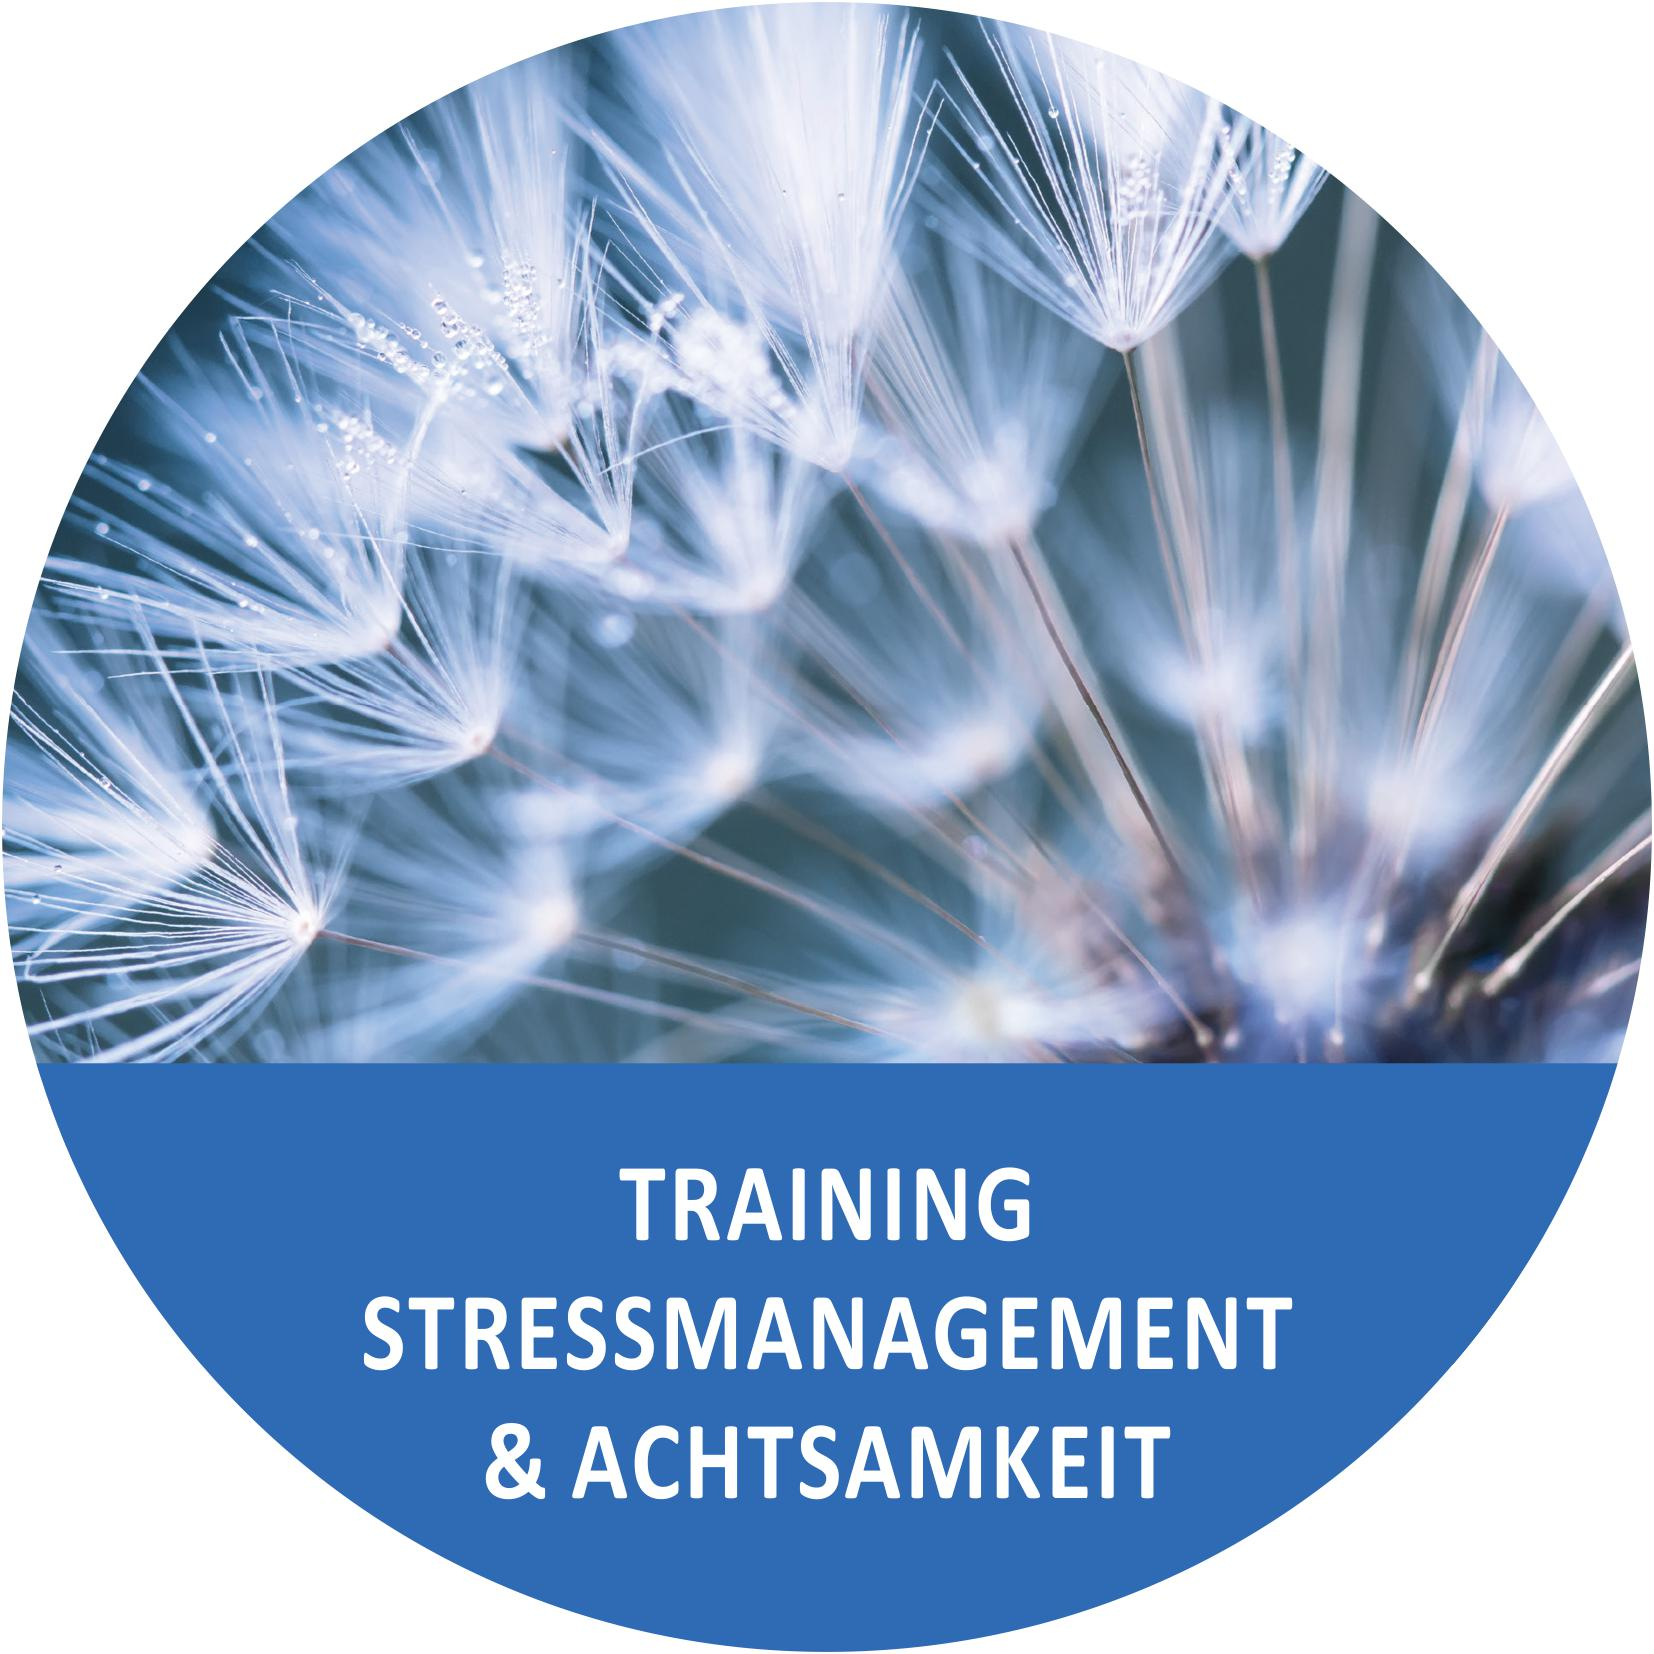 Training: Stressmanagement & Achtsamkeit